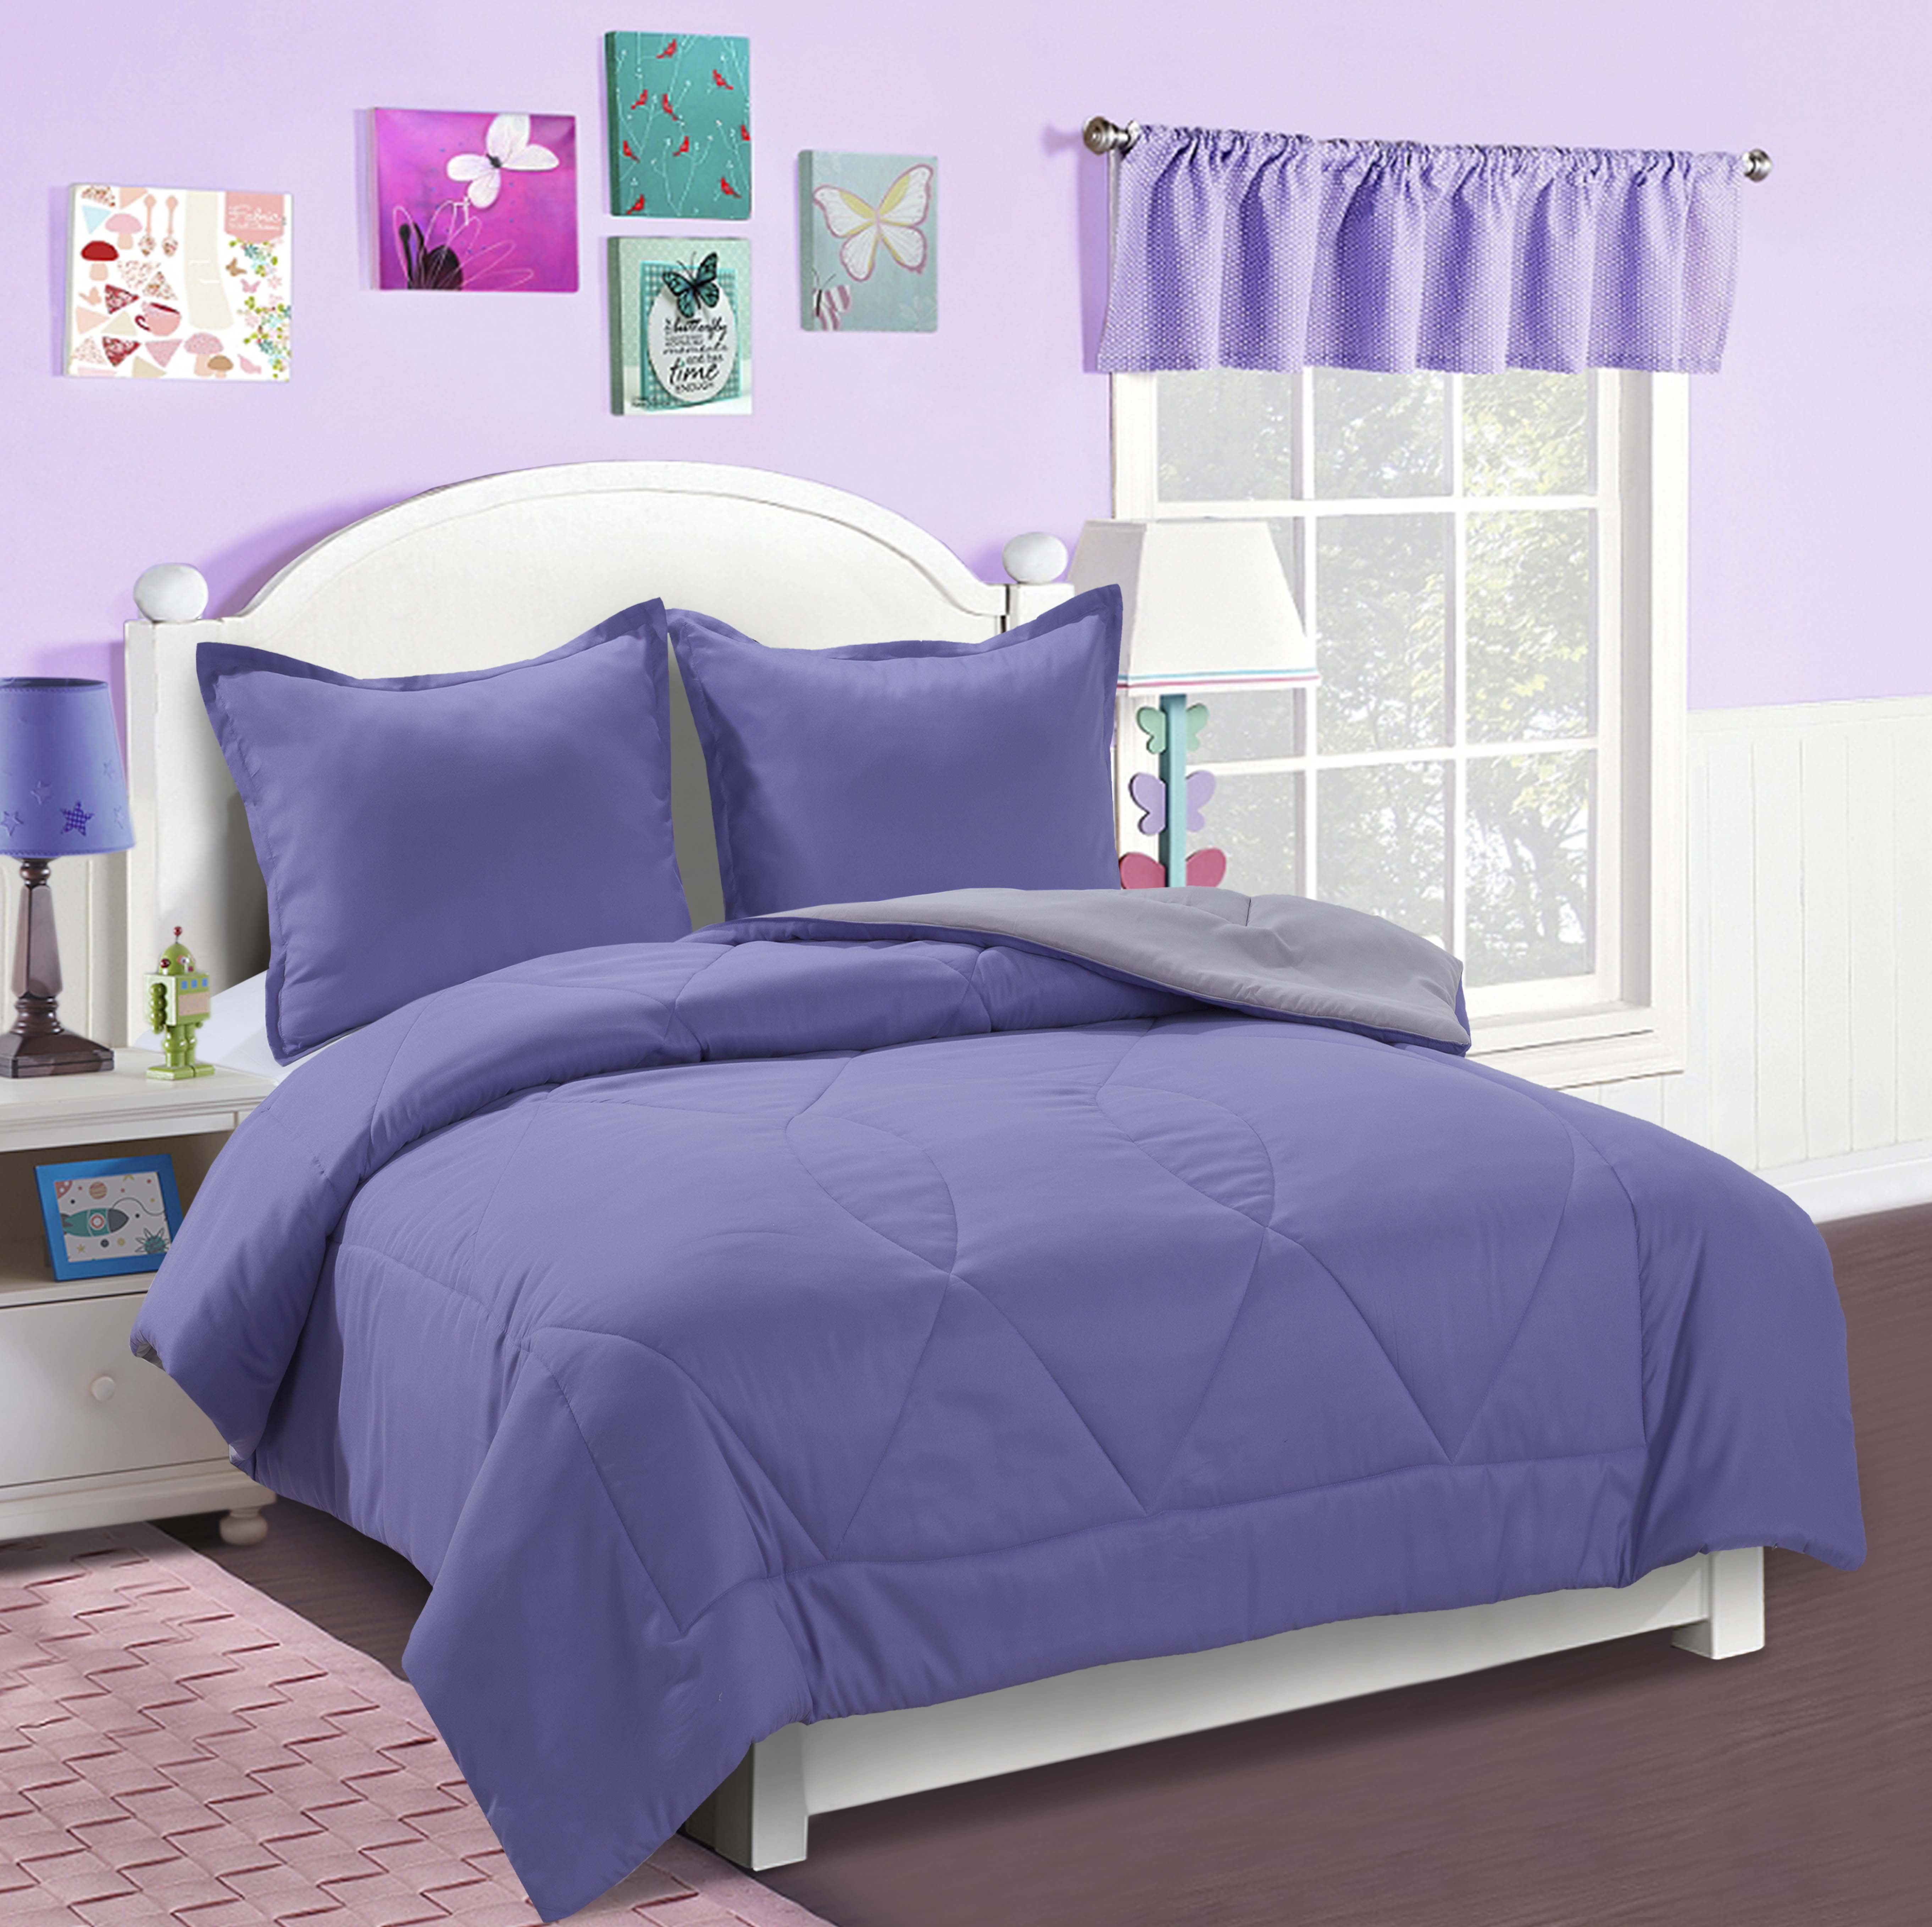 Mainstays Kids Solid Reversible Bedding Set by Jiangyin Shule Bedsheet Co.,Ltd